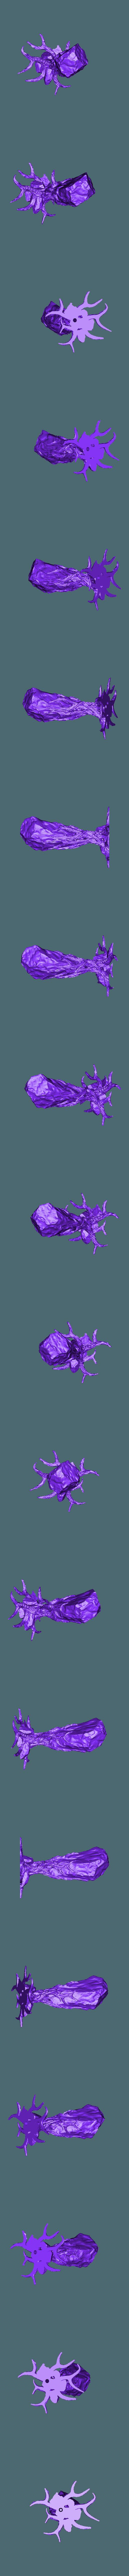 "RockClaw01.stl Download free STL file Tabletop plant: ""Rock Claw 1"" (Alien Vegetation 18) • 3D print model, GrimGreeble"